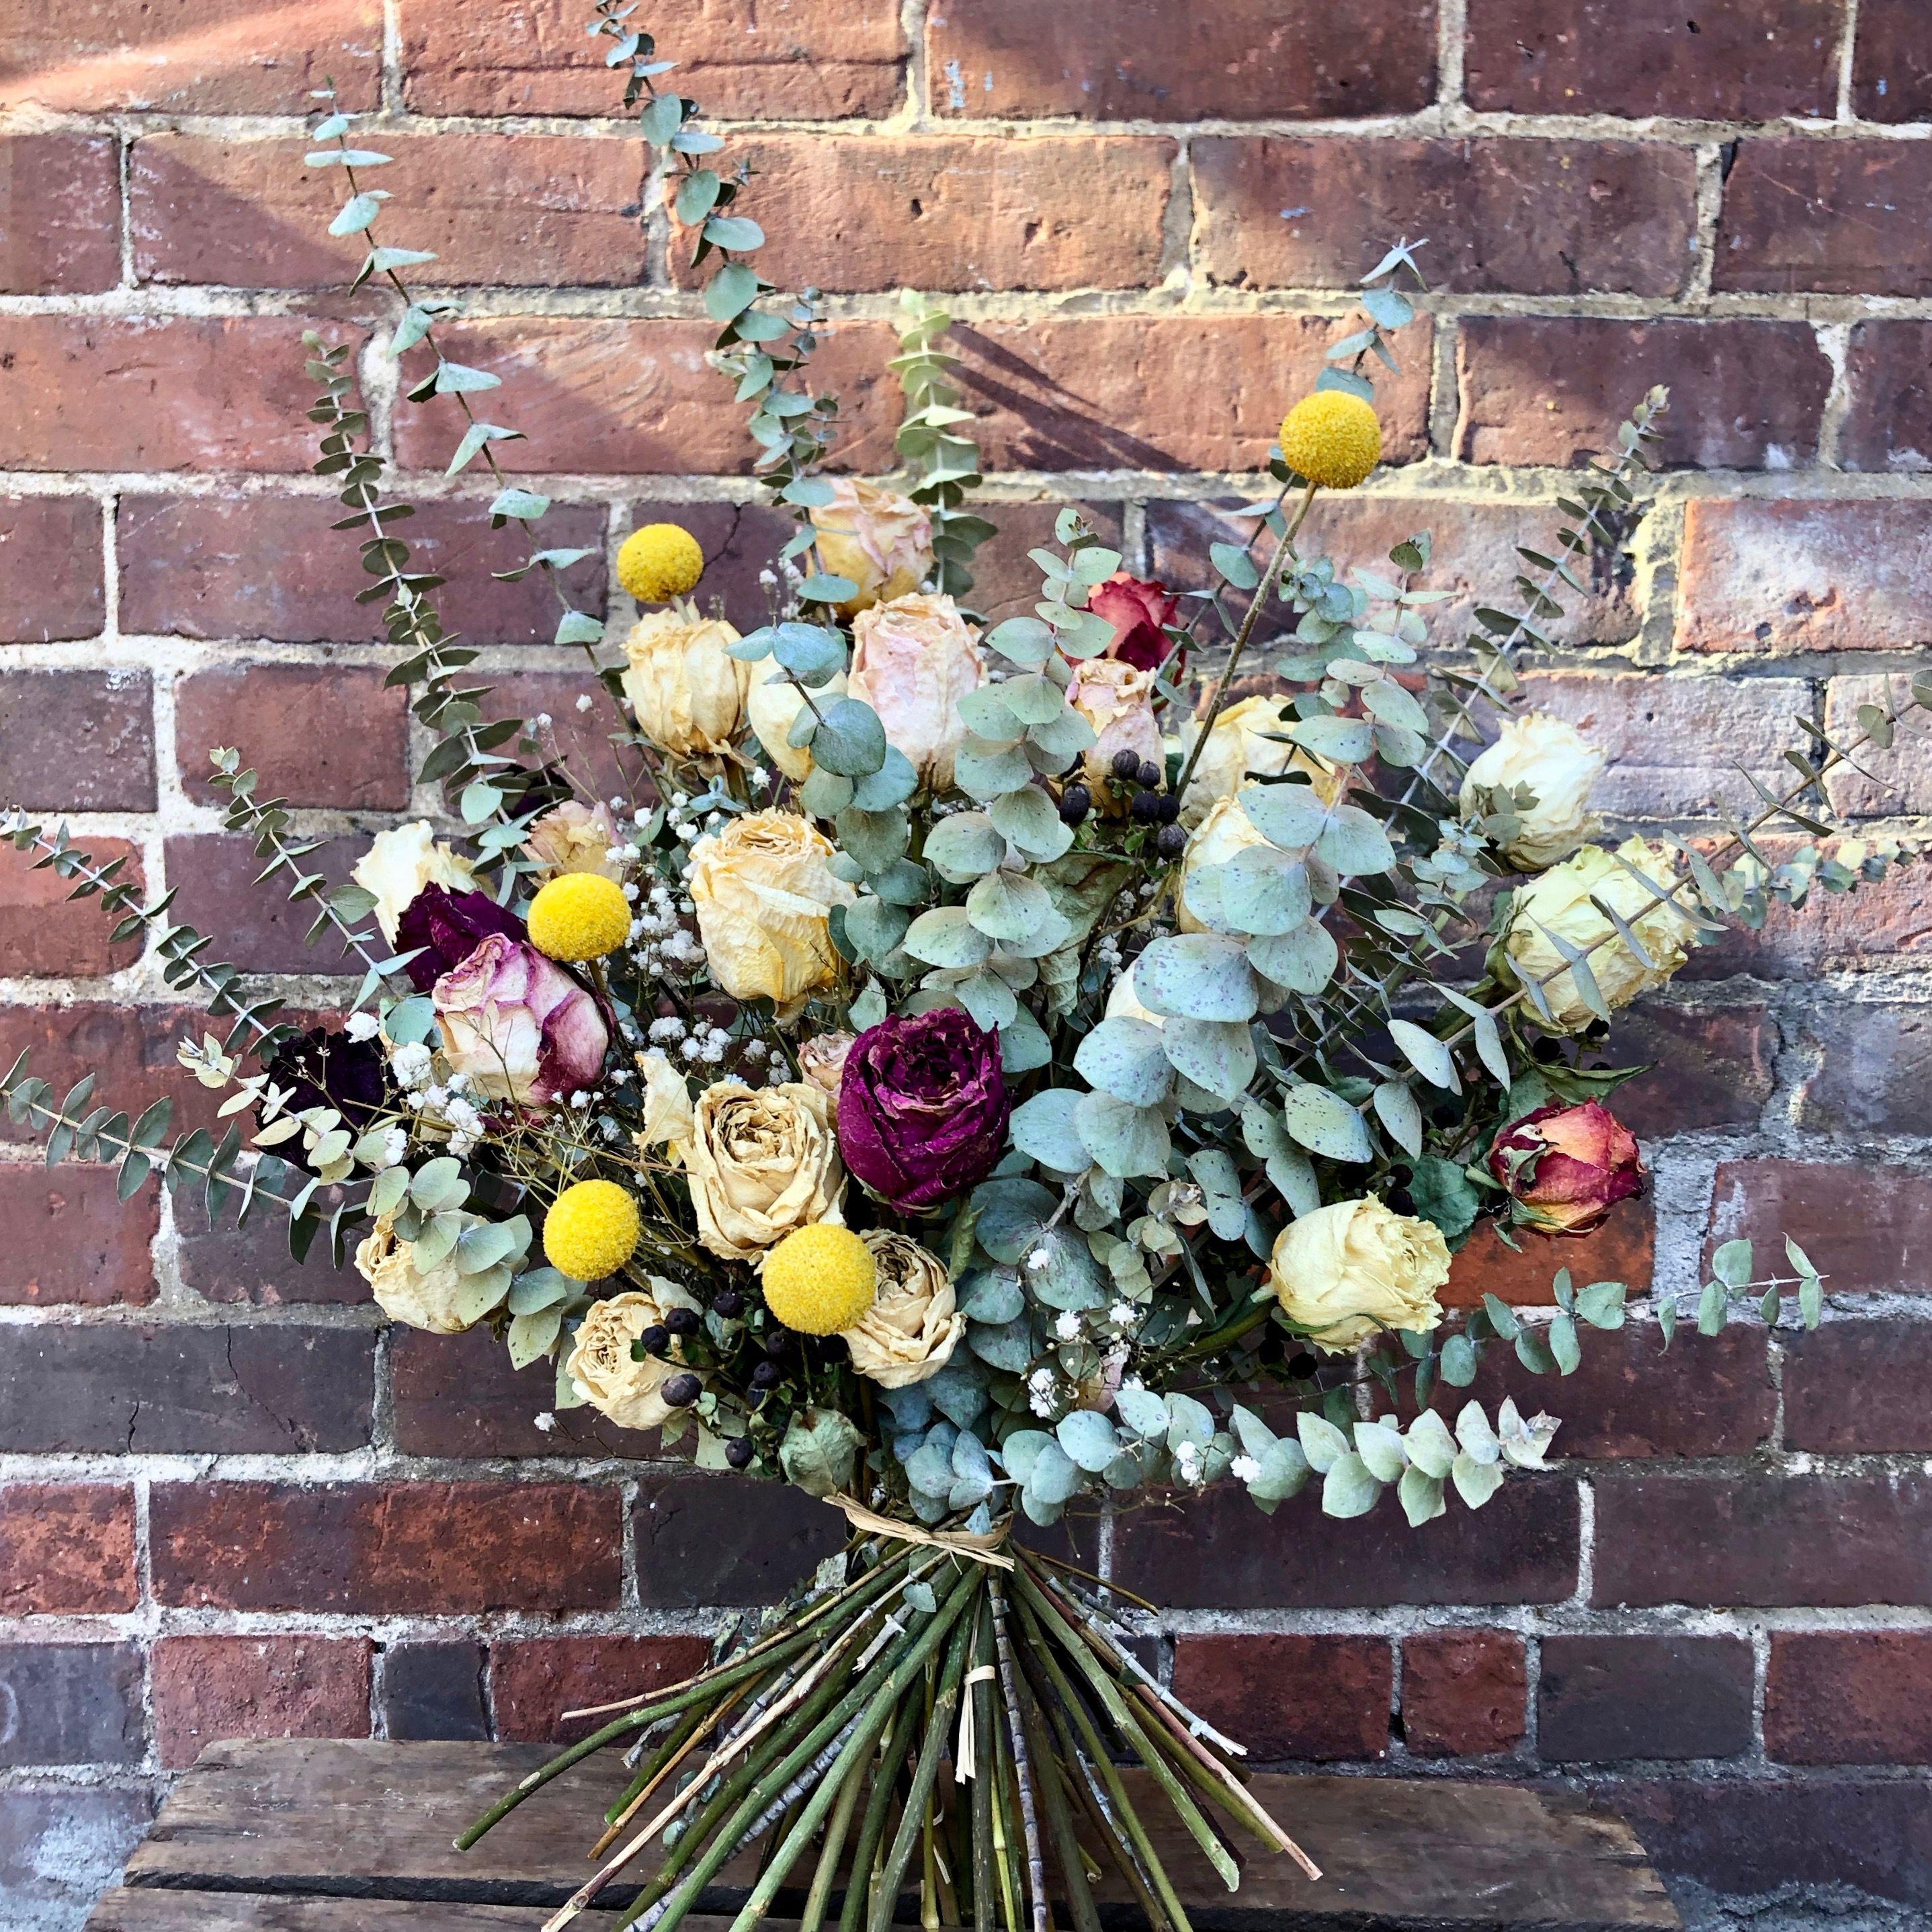 Delicate Dried Flower Bouquet Wilbe Bloomin Kensington Market S Flower Emporium Toronto Ontario